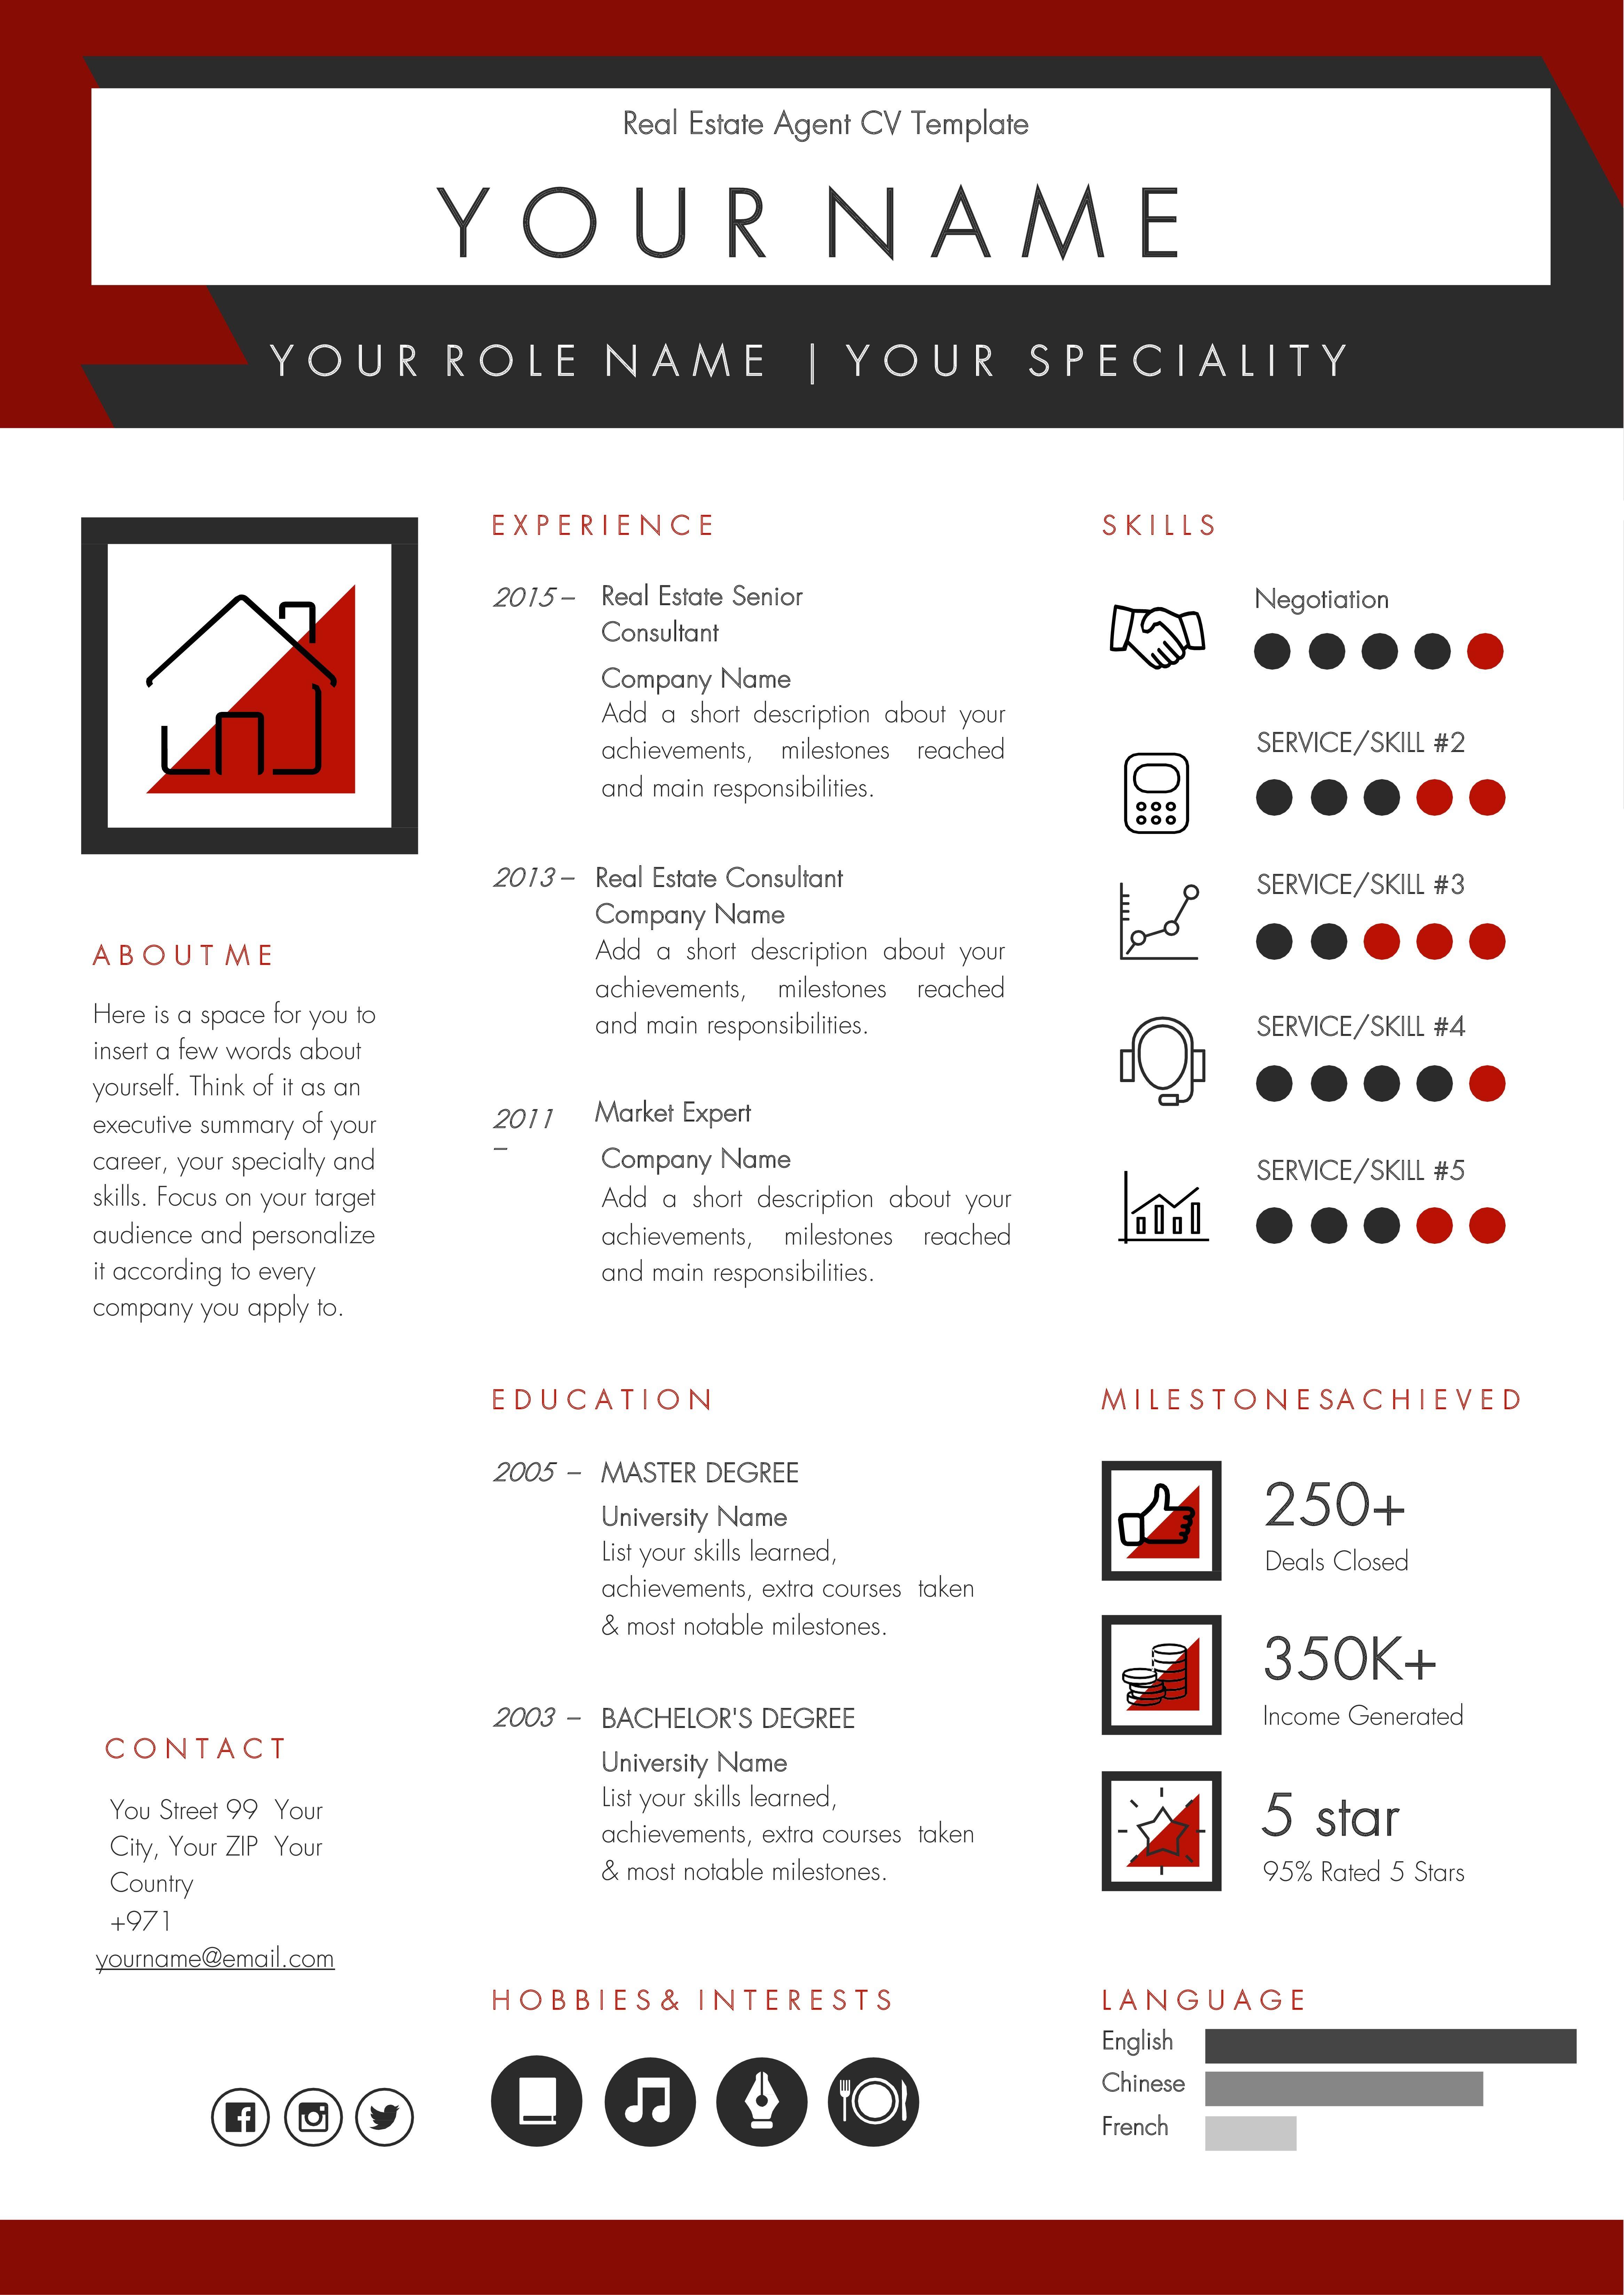 Real estate agent broker cv template in 2020 real